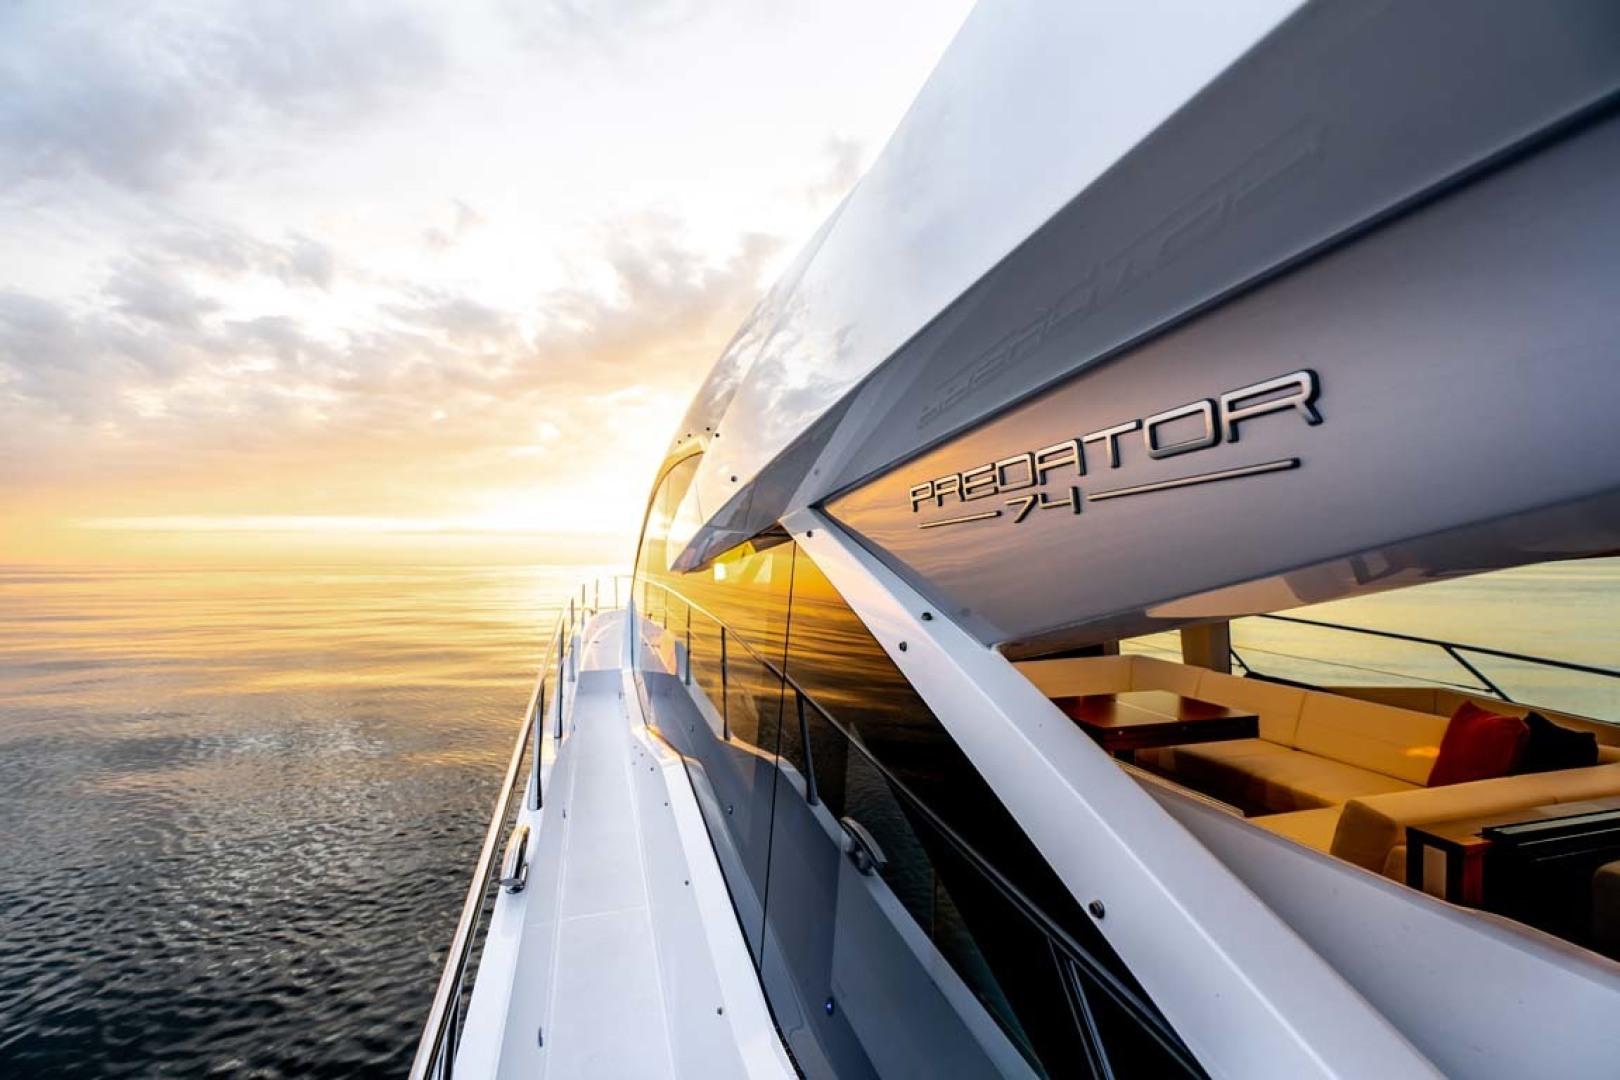 Sunseeker-Predator 2020-WIND@SEA Ft. Lauderdale-Florida-United States Port Deck-1457477 | Thumbnail